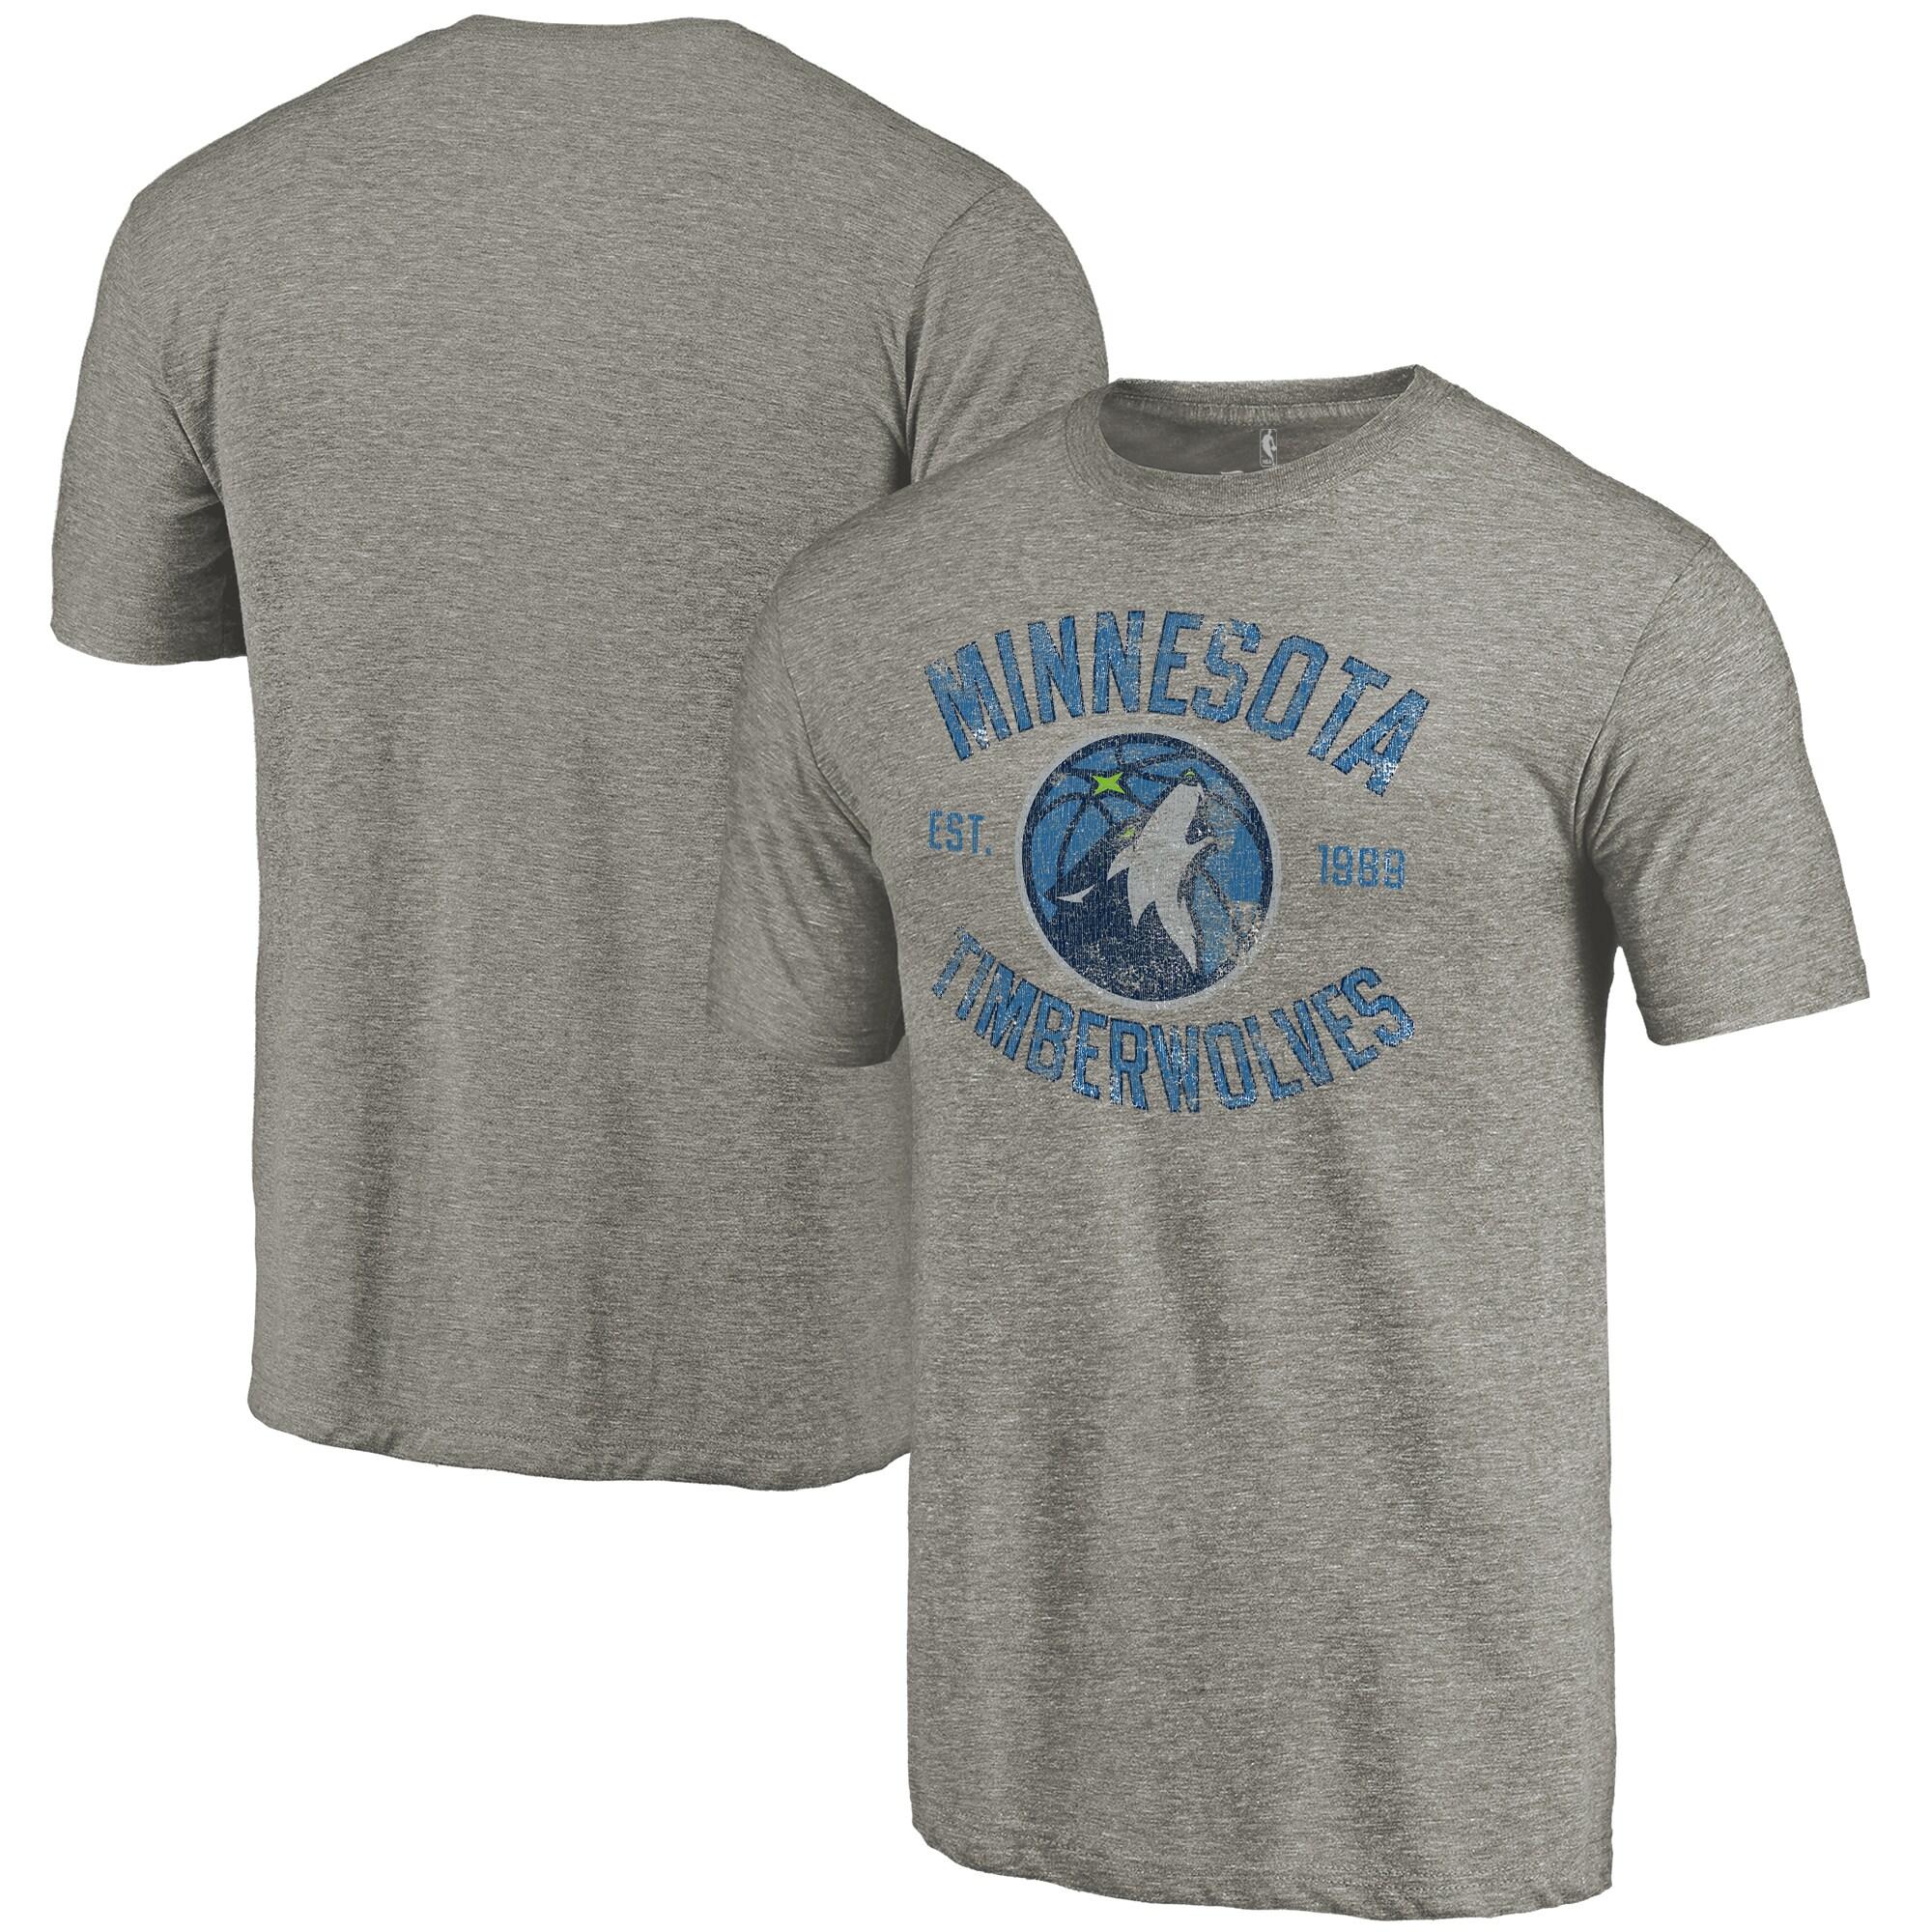 Minnesota Timberwolves Fanatics Branded Team Heritage Tri-Blend T-Shirt - Gray